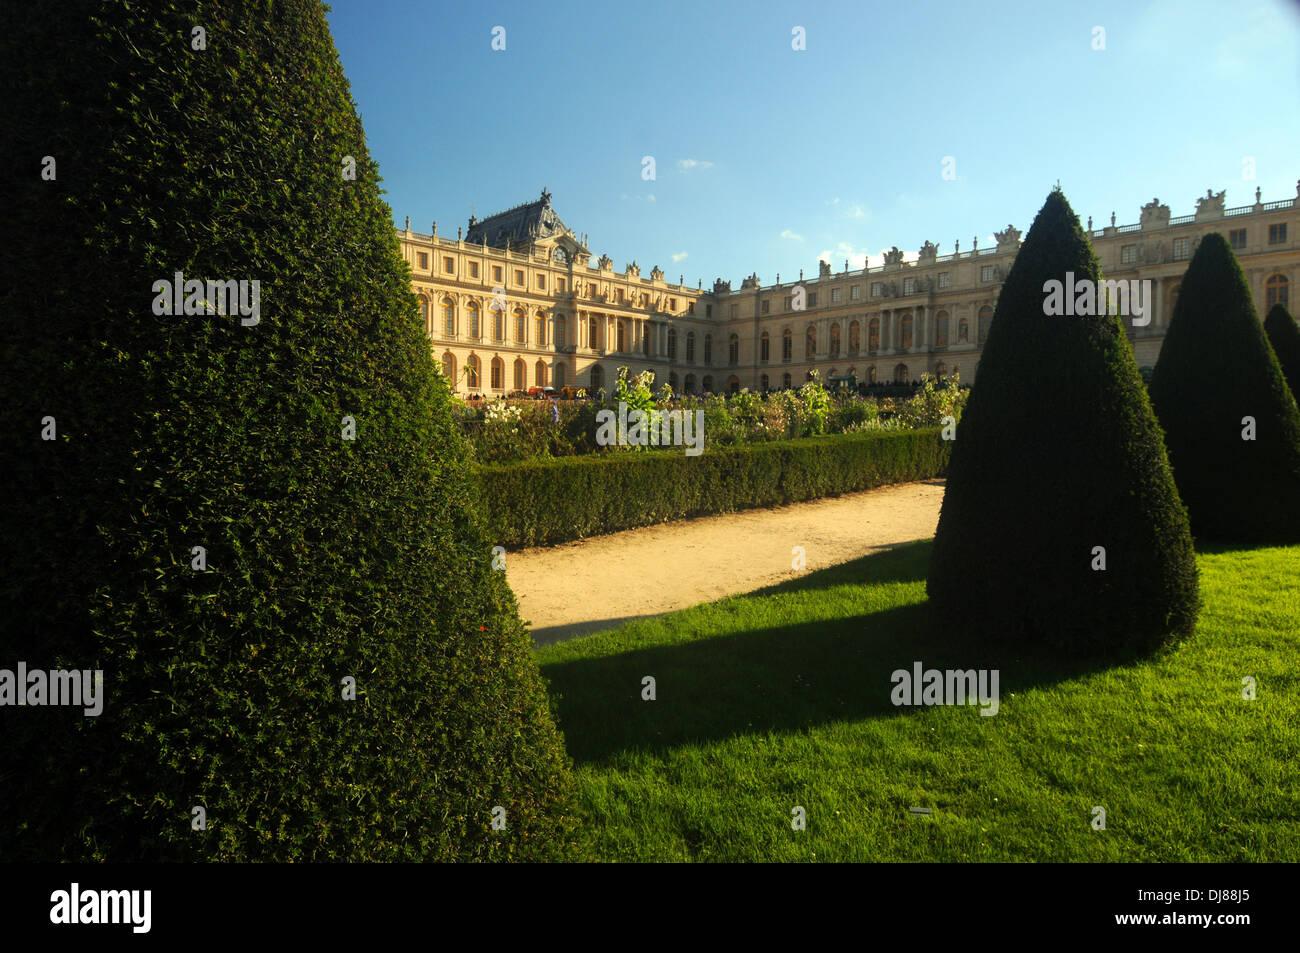 Gardens of the palace at Versailles, Paris, France. No PR - Stock Image